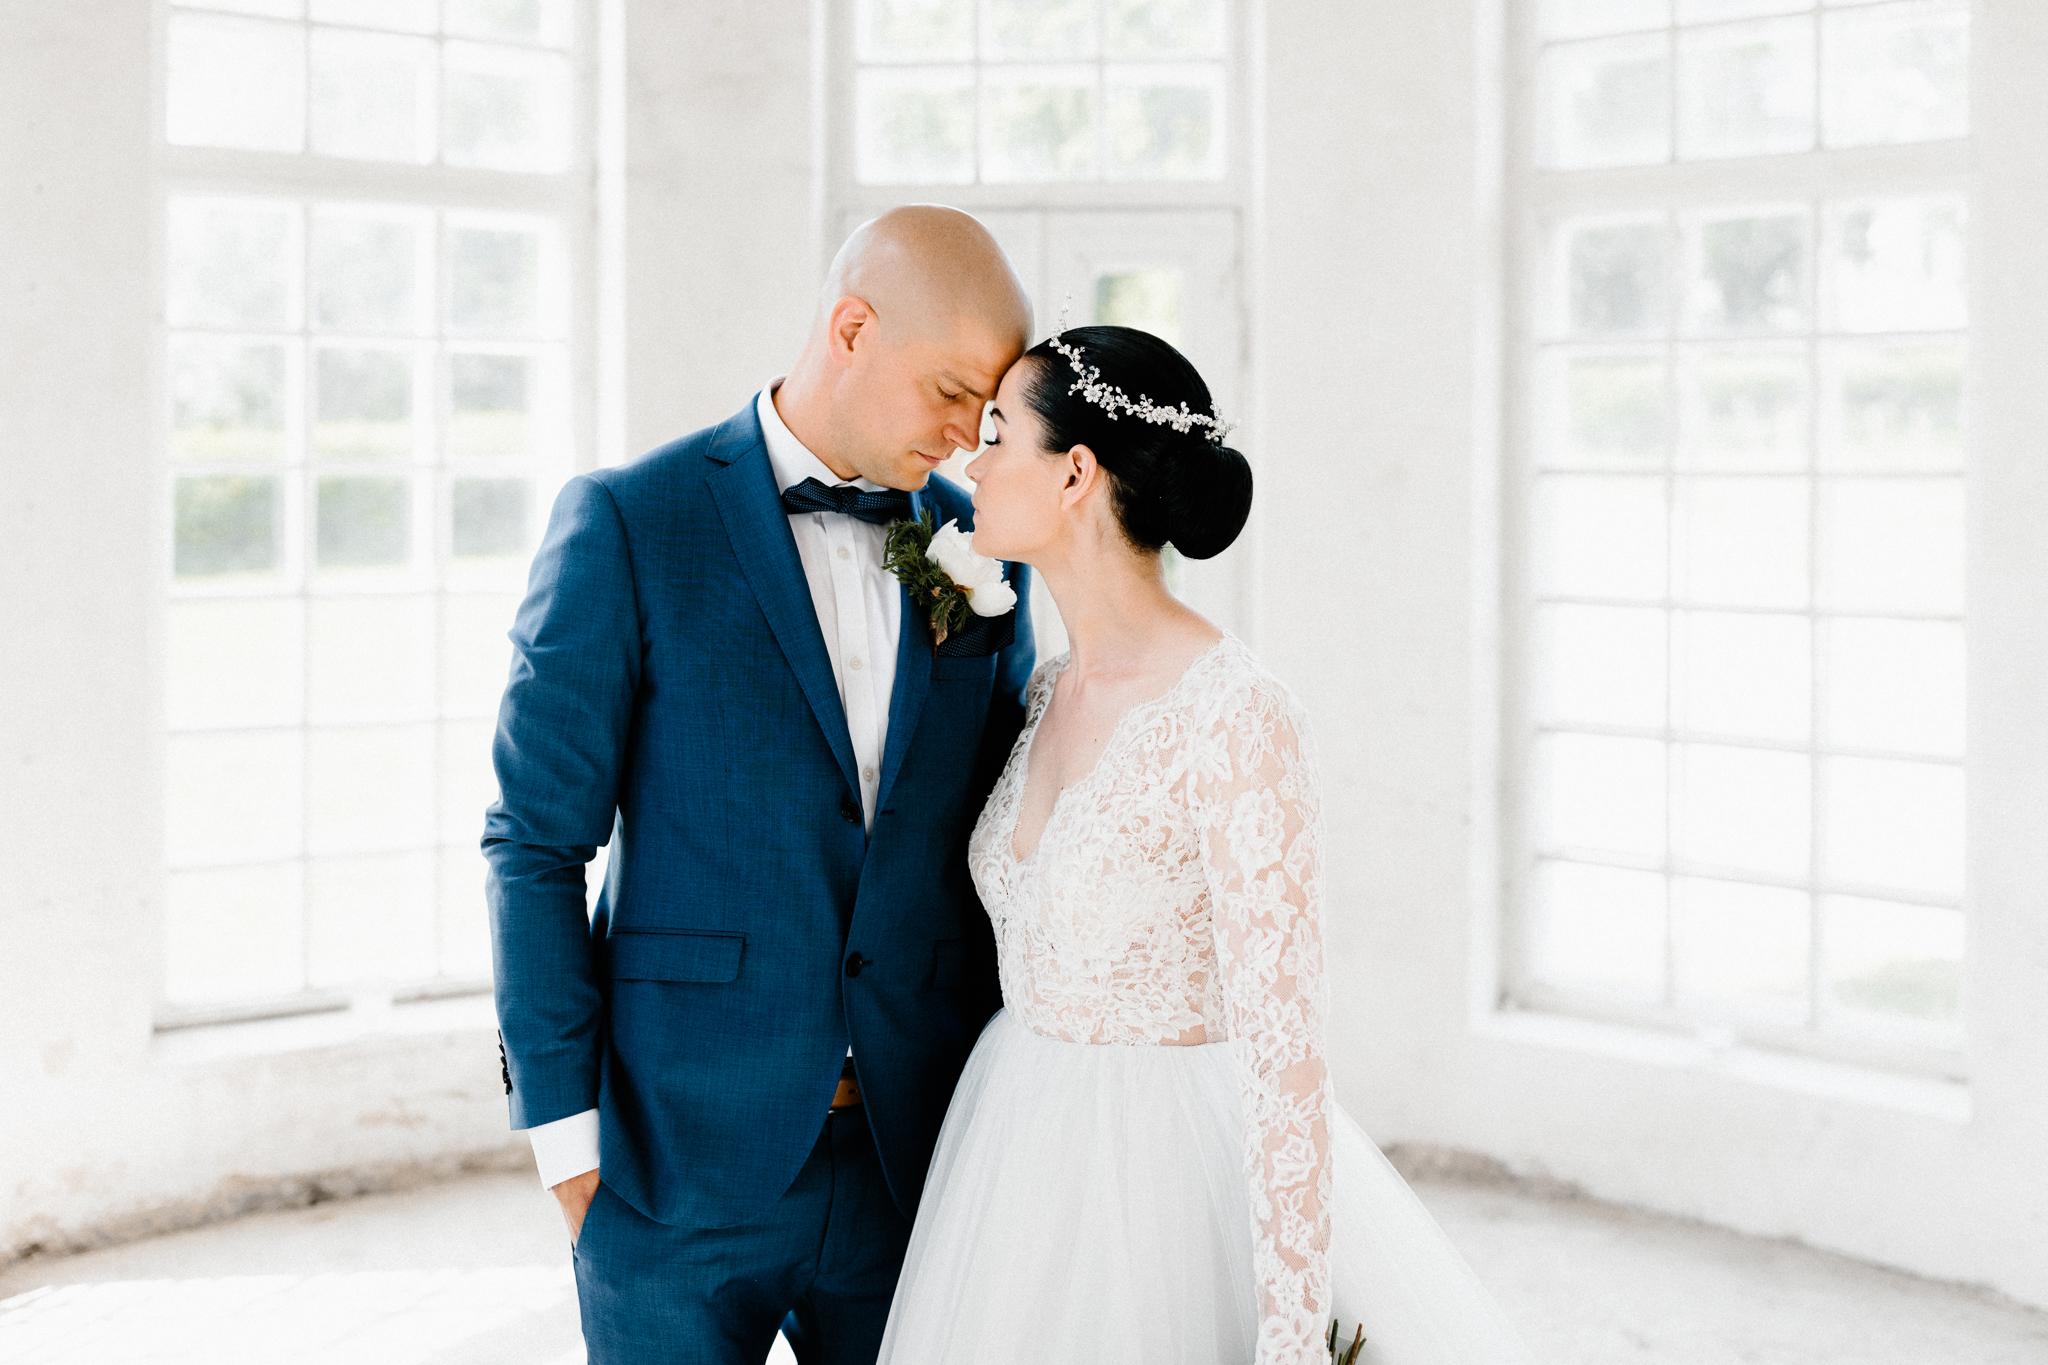 Essi + Ville   Oitbacka Gården   by Patrick Karkkolainen Wedding Photography-72.jpg